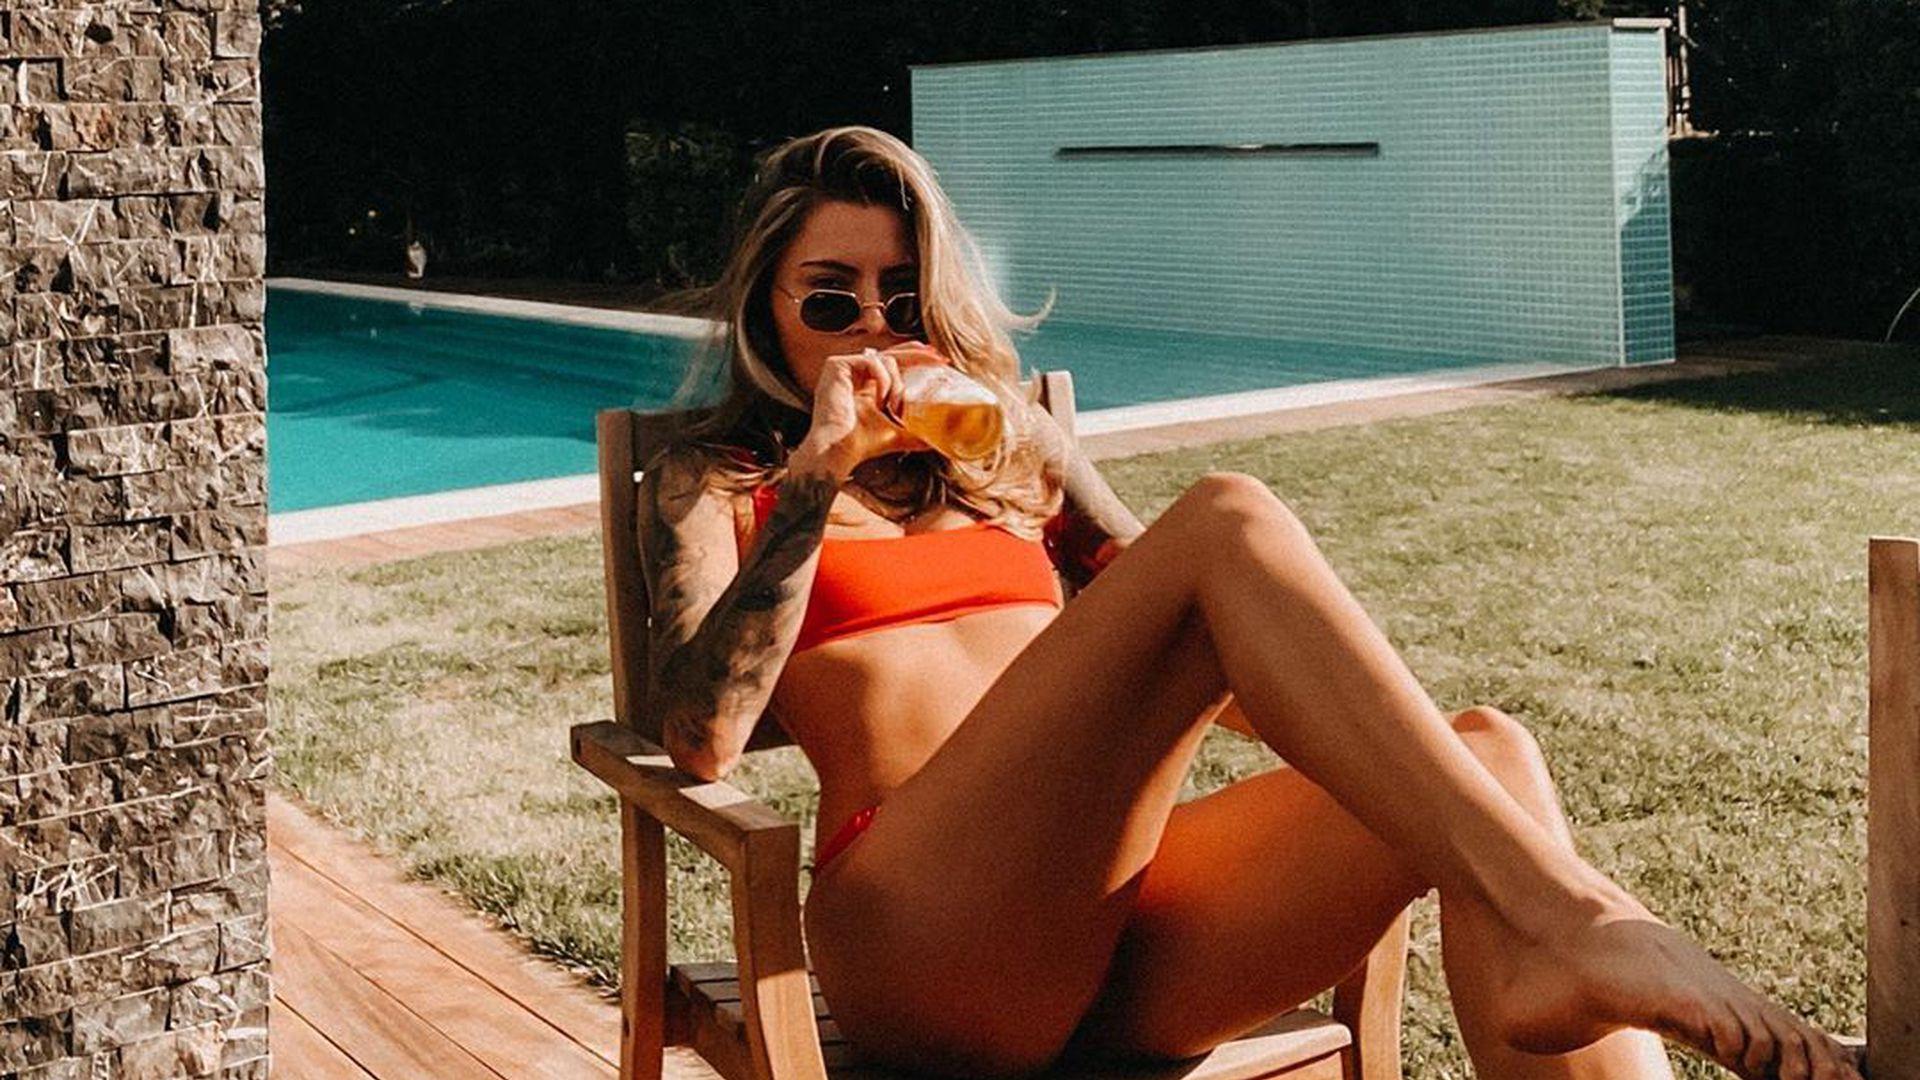 Simone Thomalla Bikini